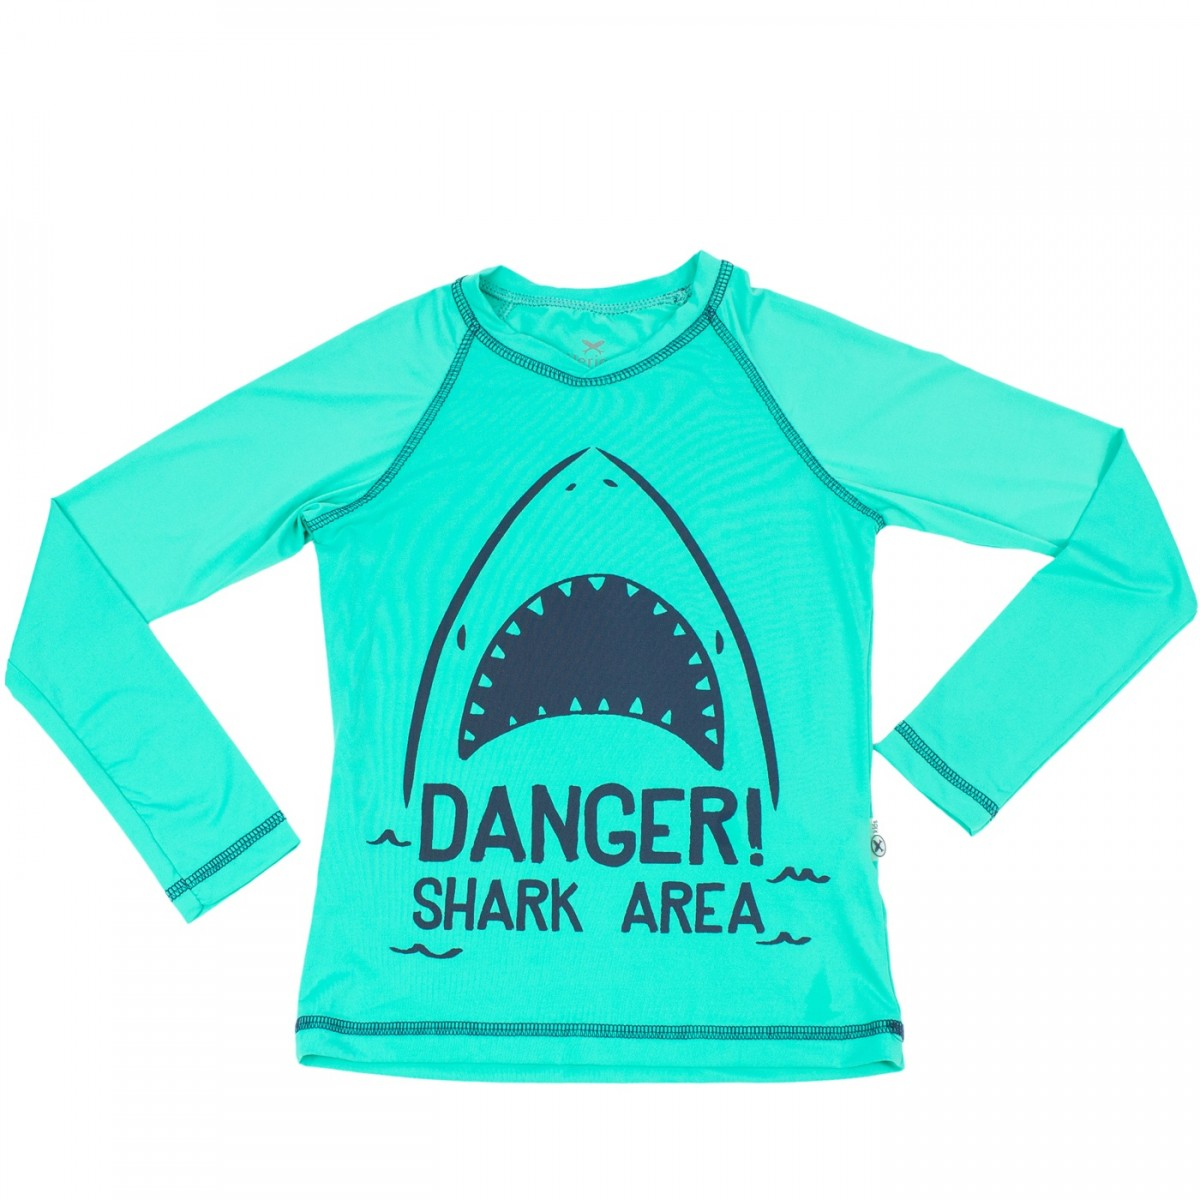 Bizz Store - Camiseta Infantil Hering Kids Com Proteção Solar 7d3403ccffbf9